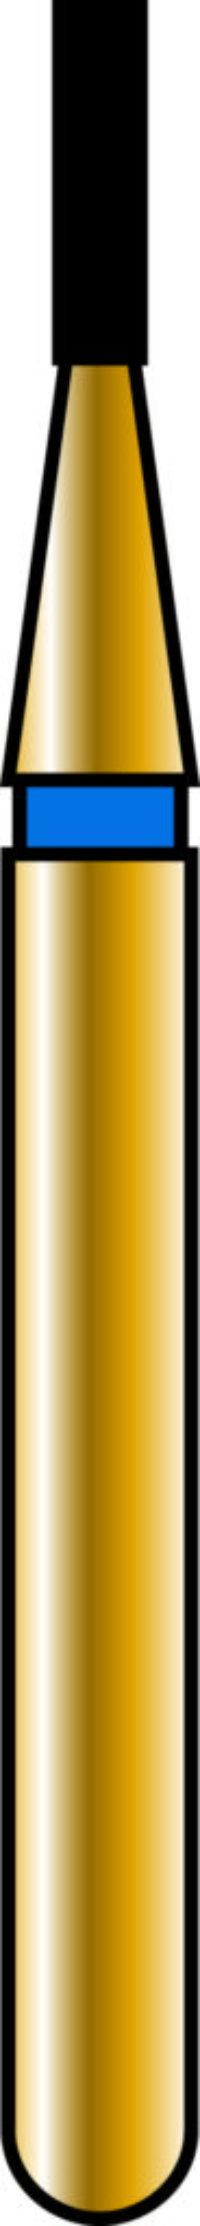 Flat End Cylinder 08-3mm Gold Diamond Bur